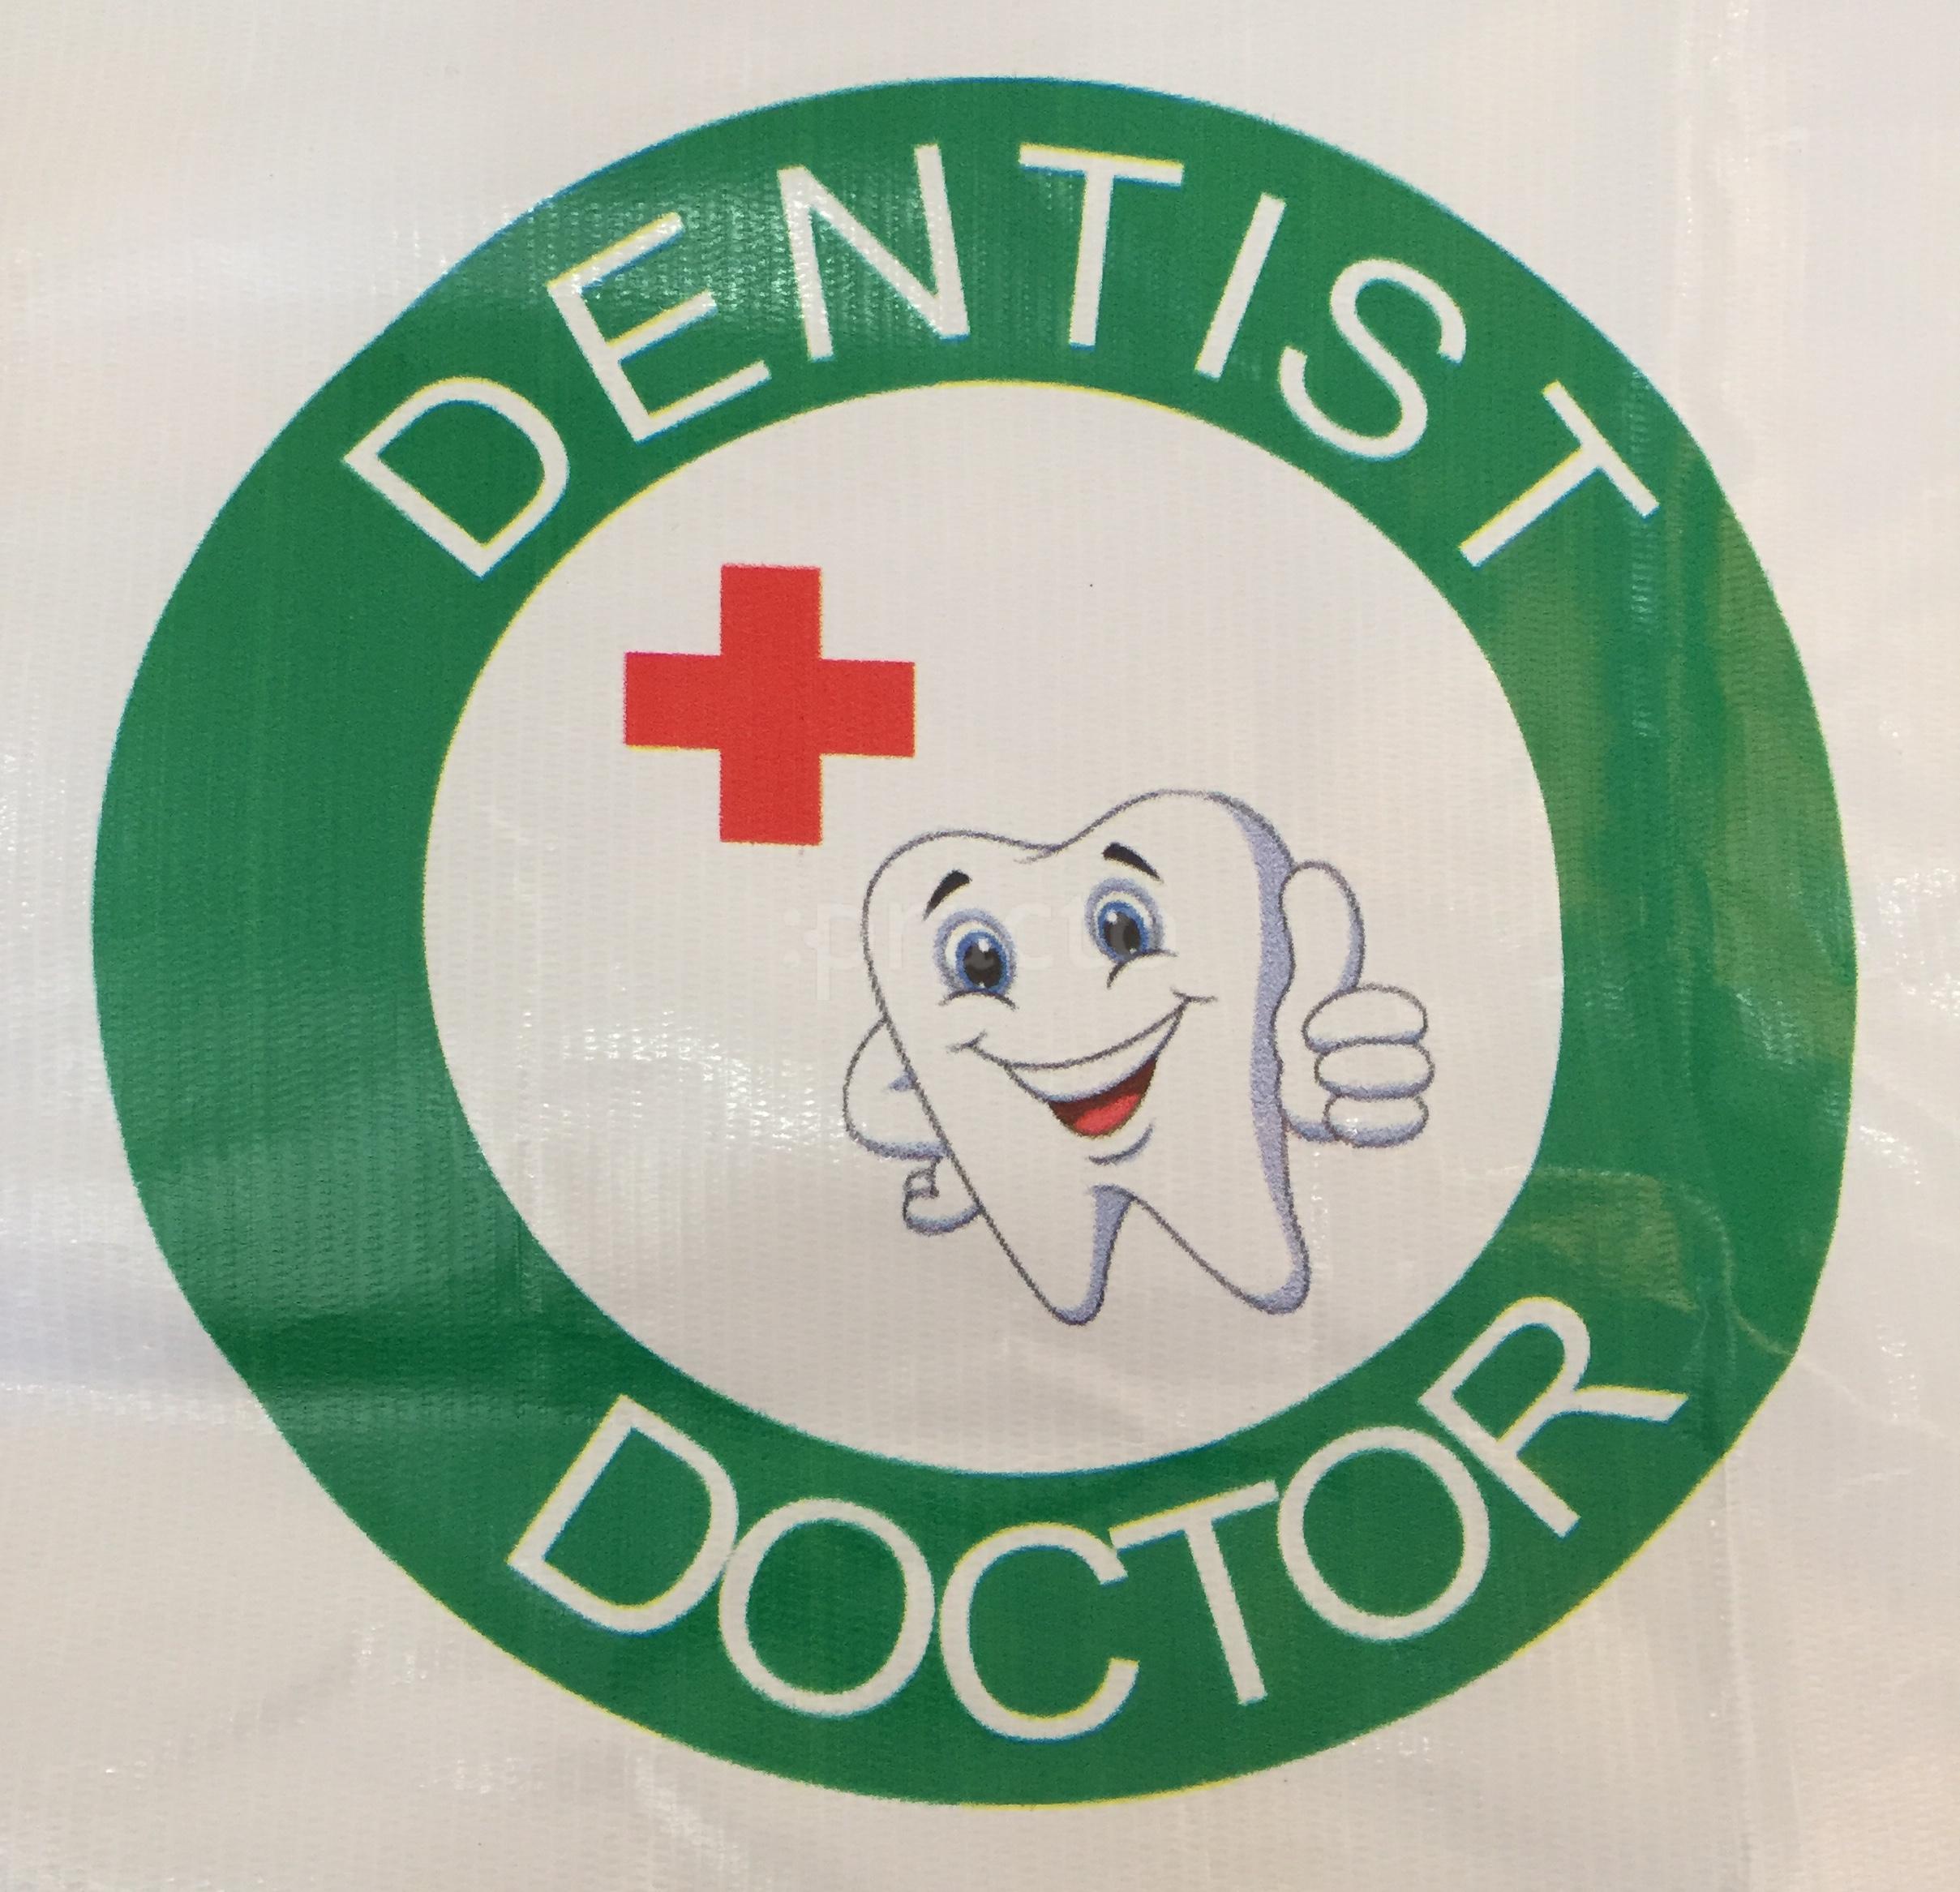 Dr. Mehta's Medical & Dental Clinic